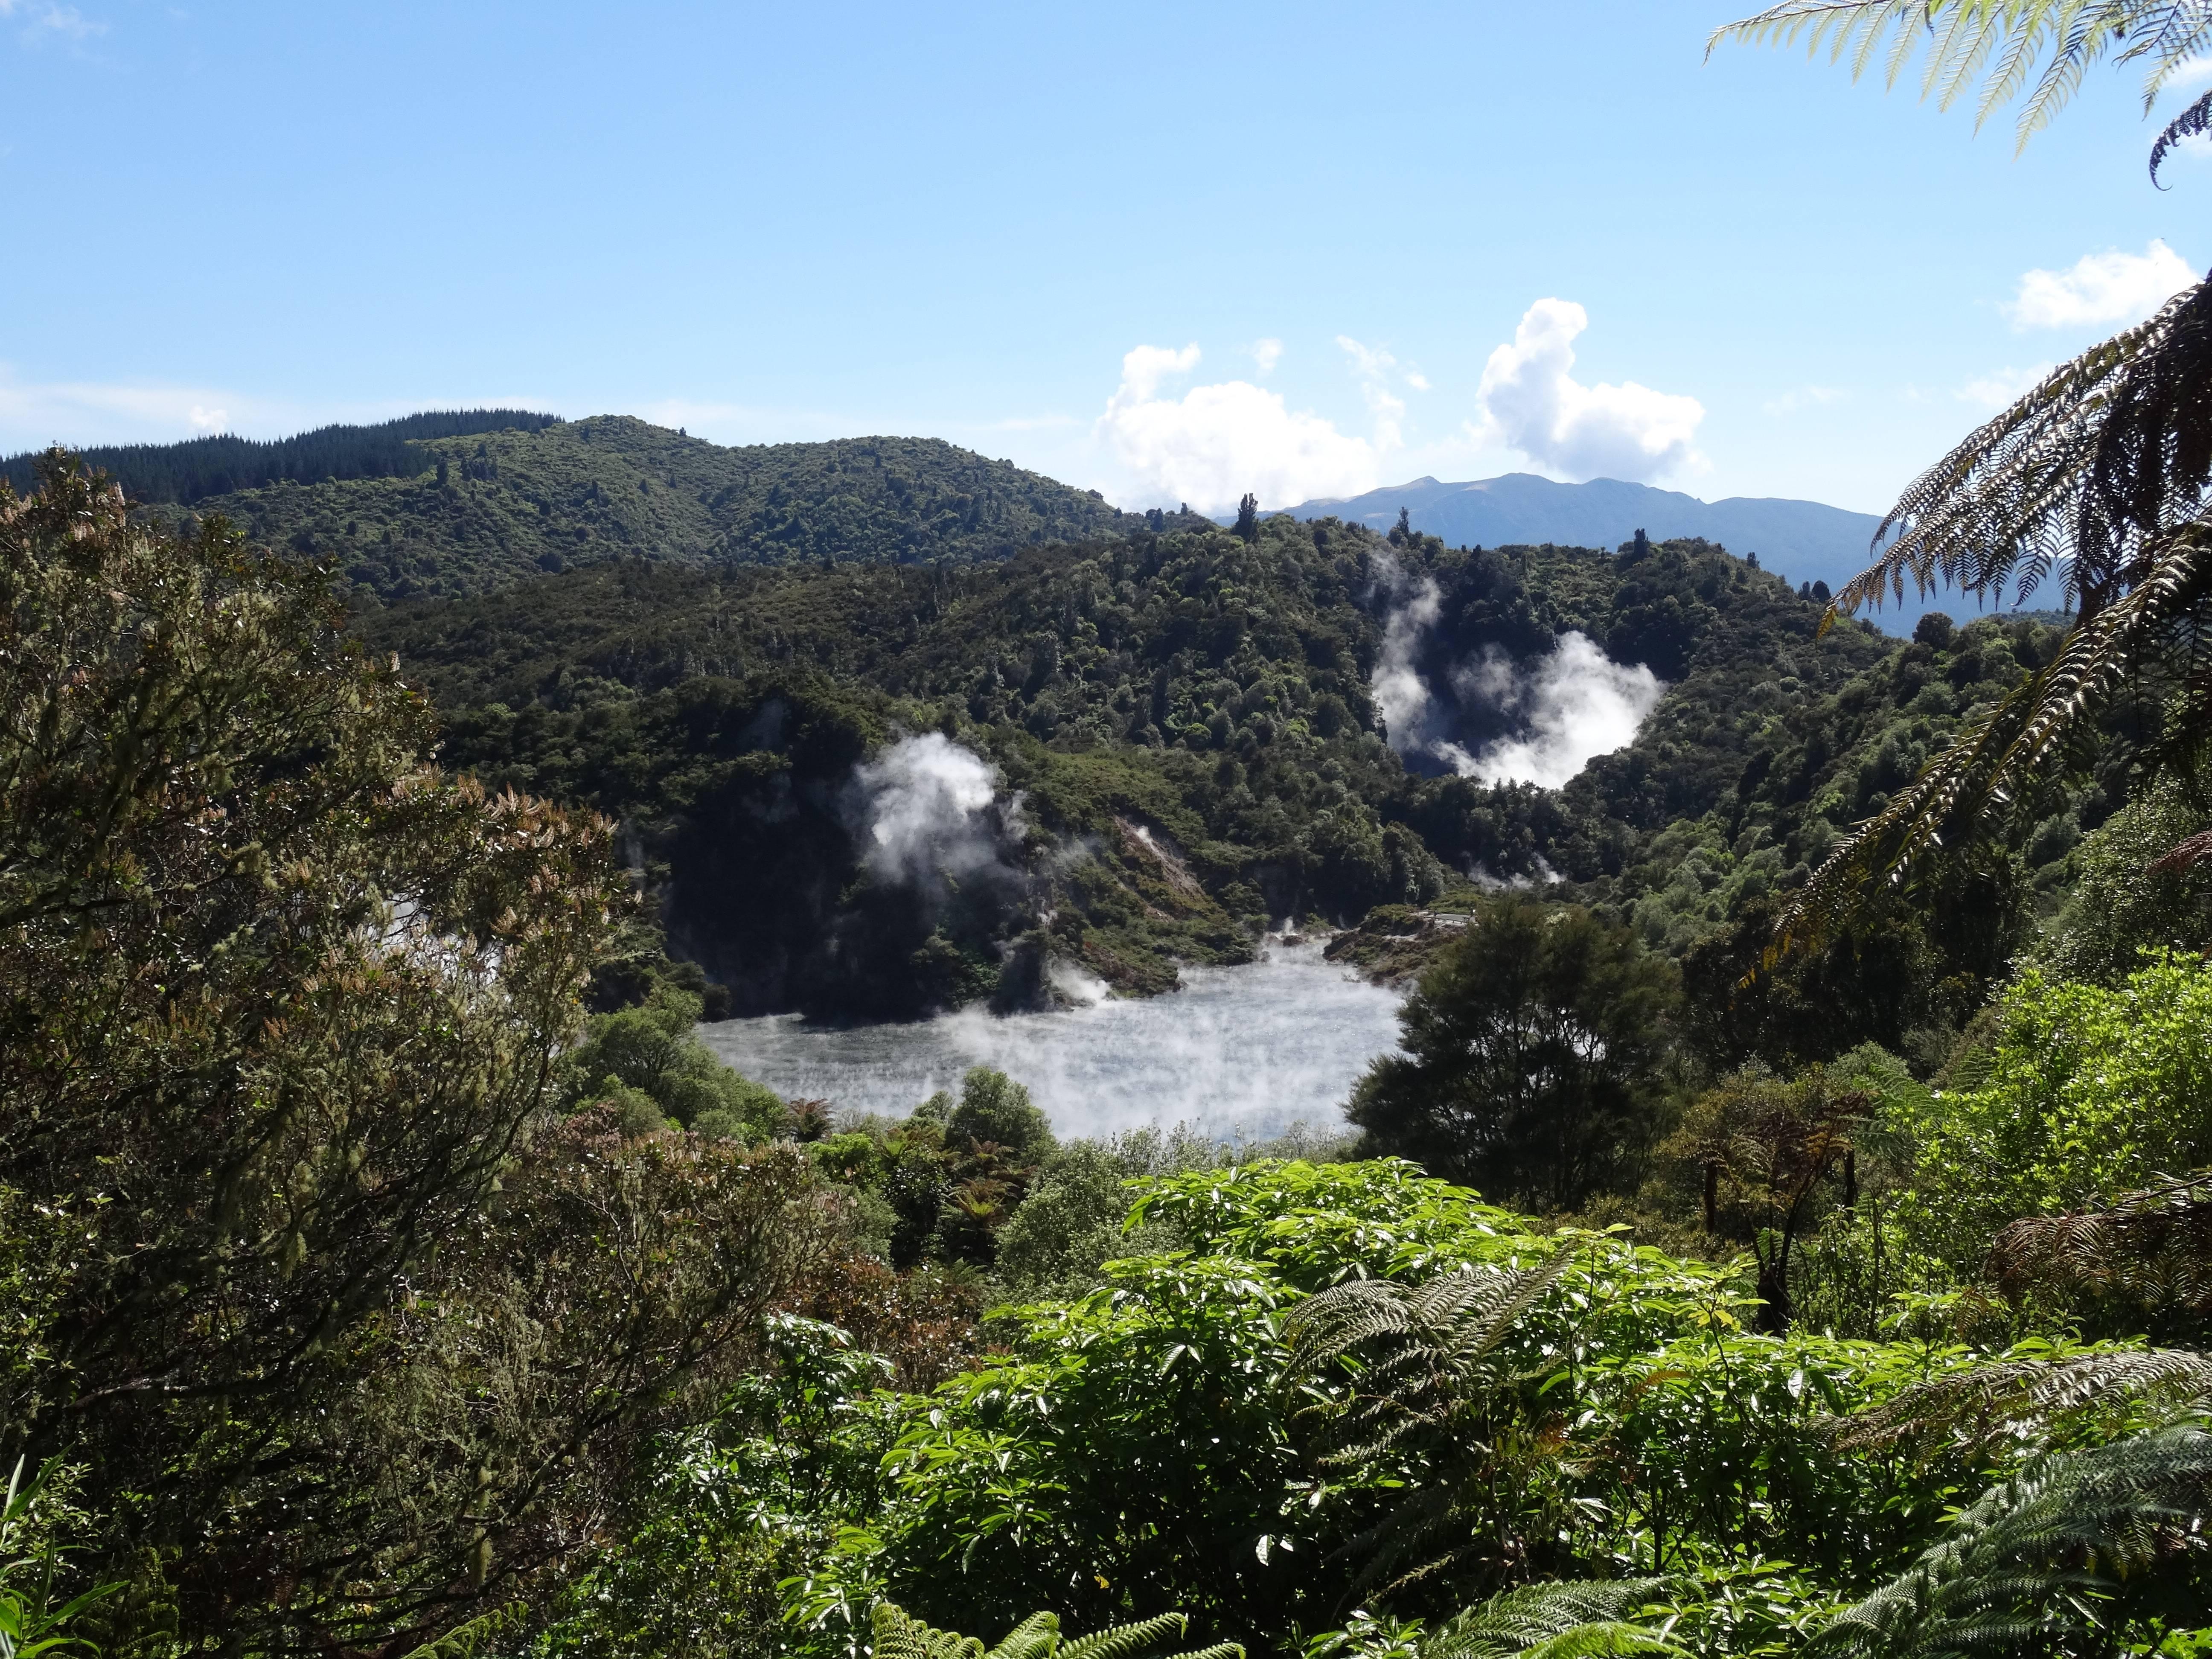 Photo 1: Waimangu Volcanic Valley, Rotorua, Nouvelle-Zélande